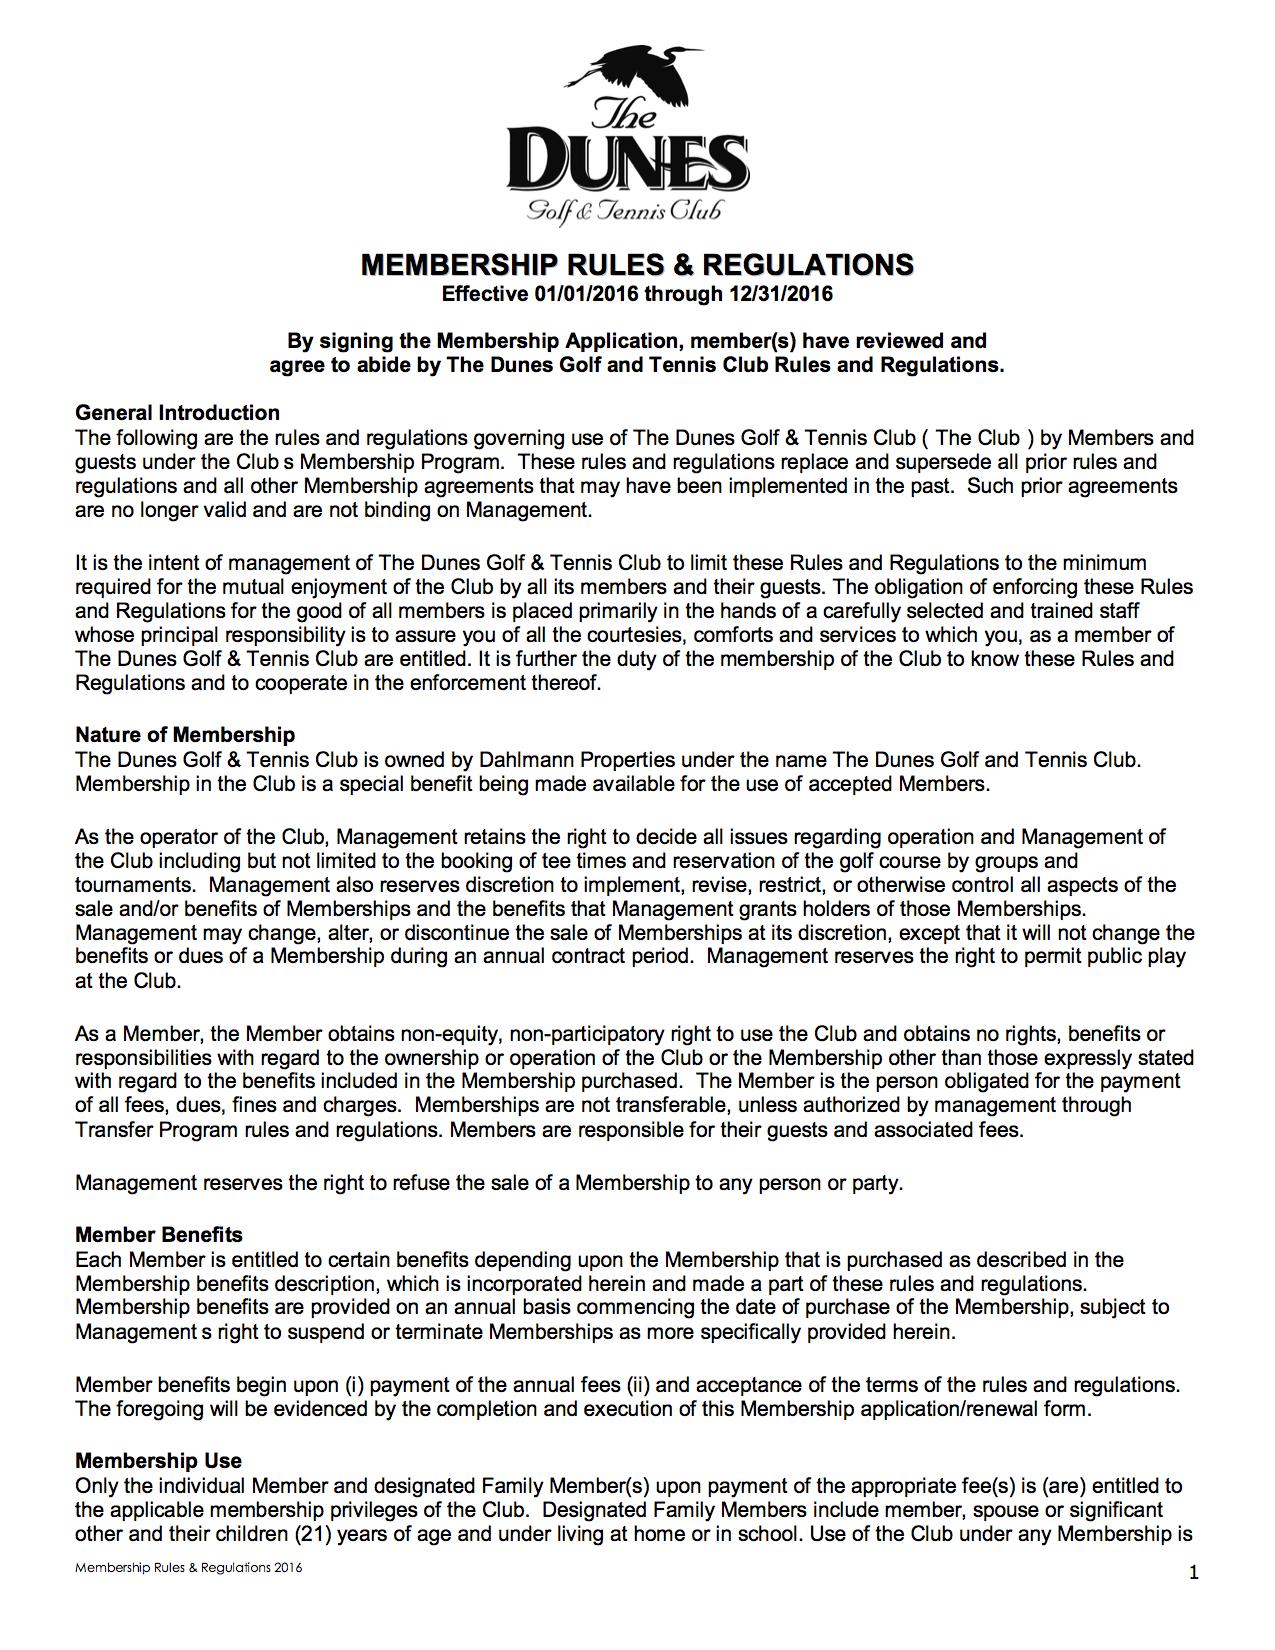 Dunes Golf Club Membership Rules & Regs